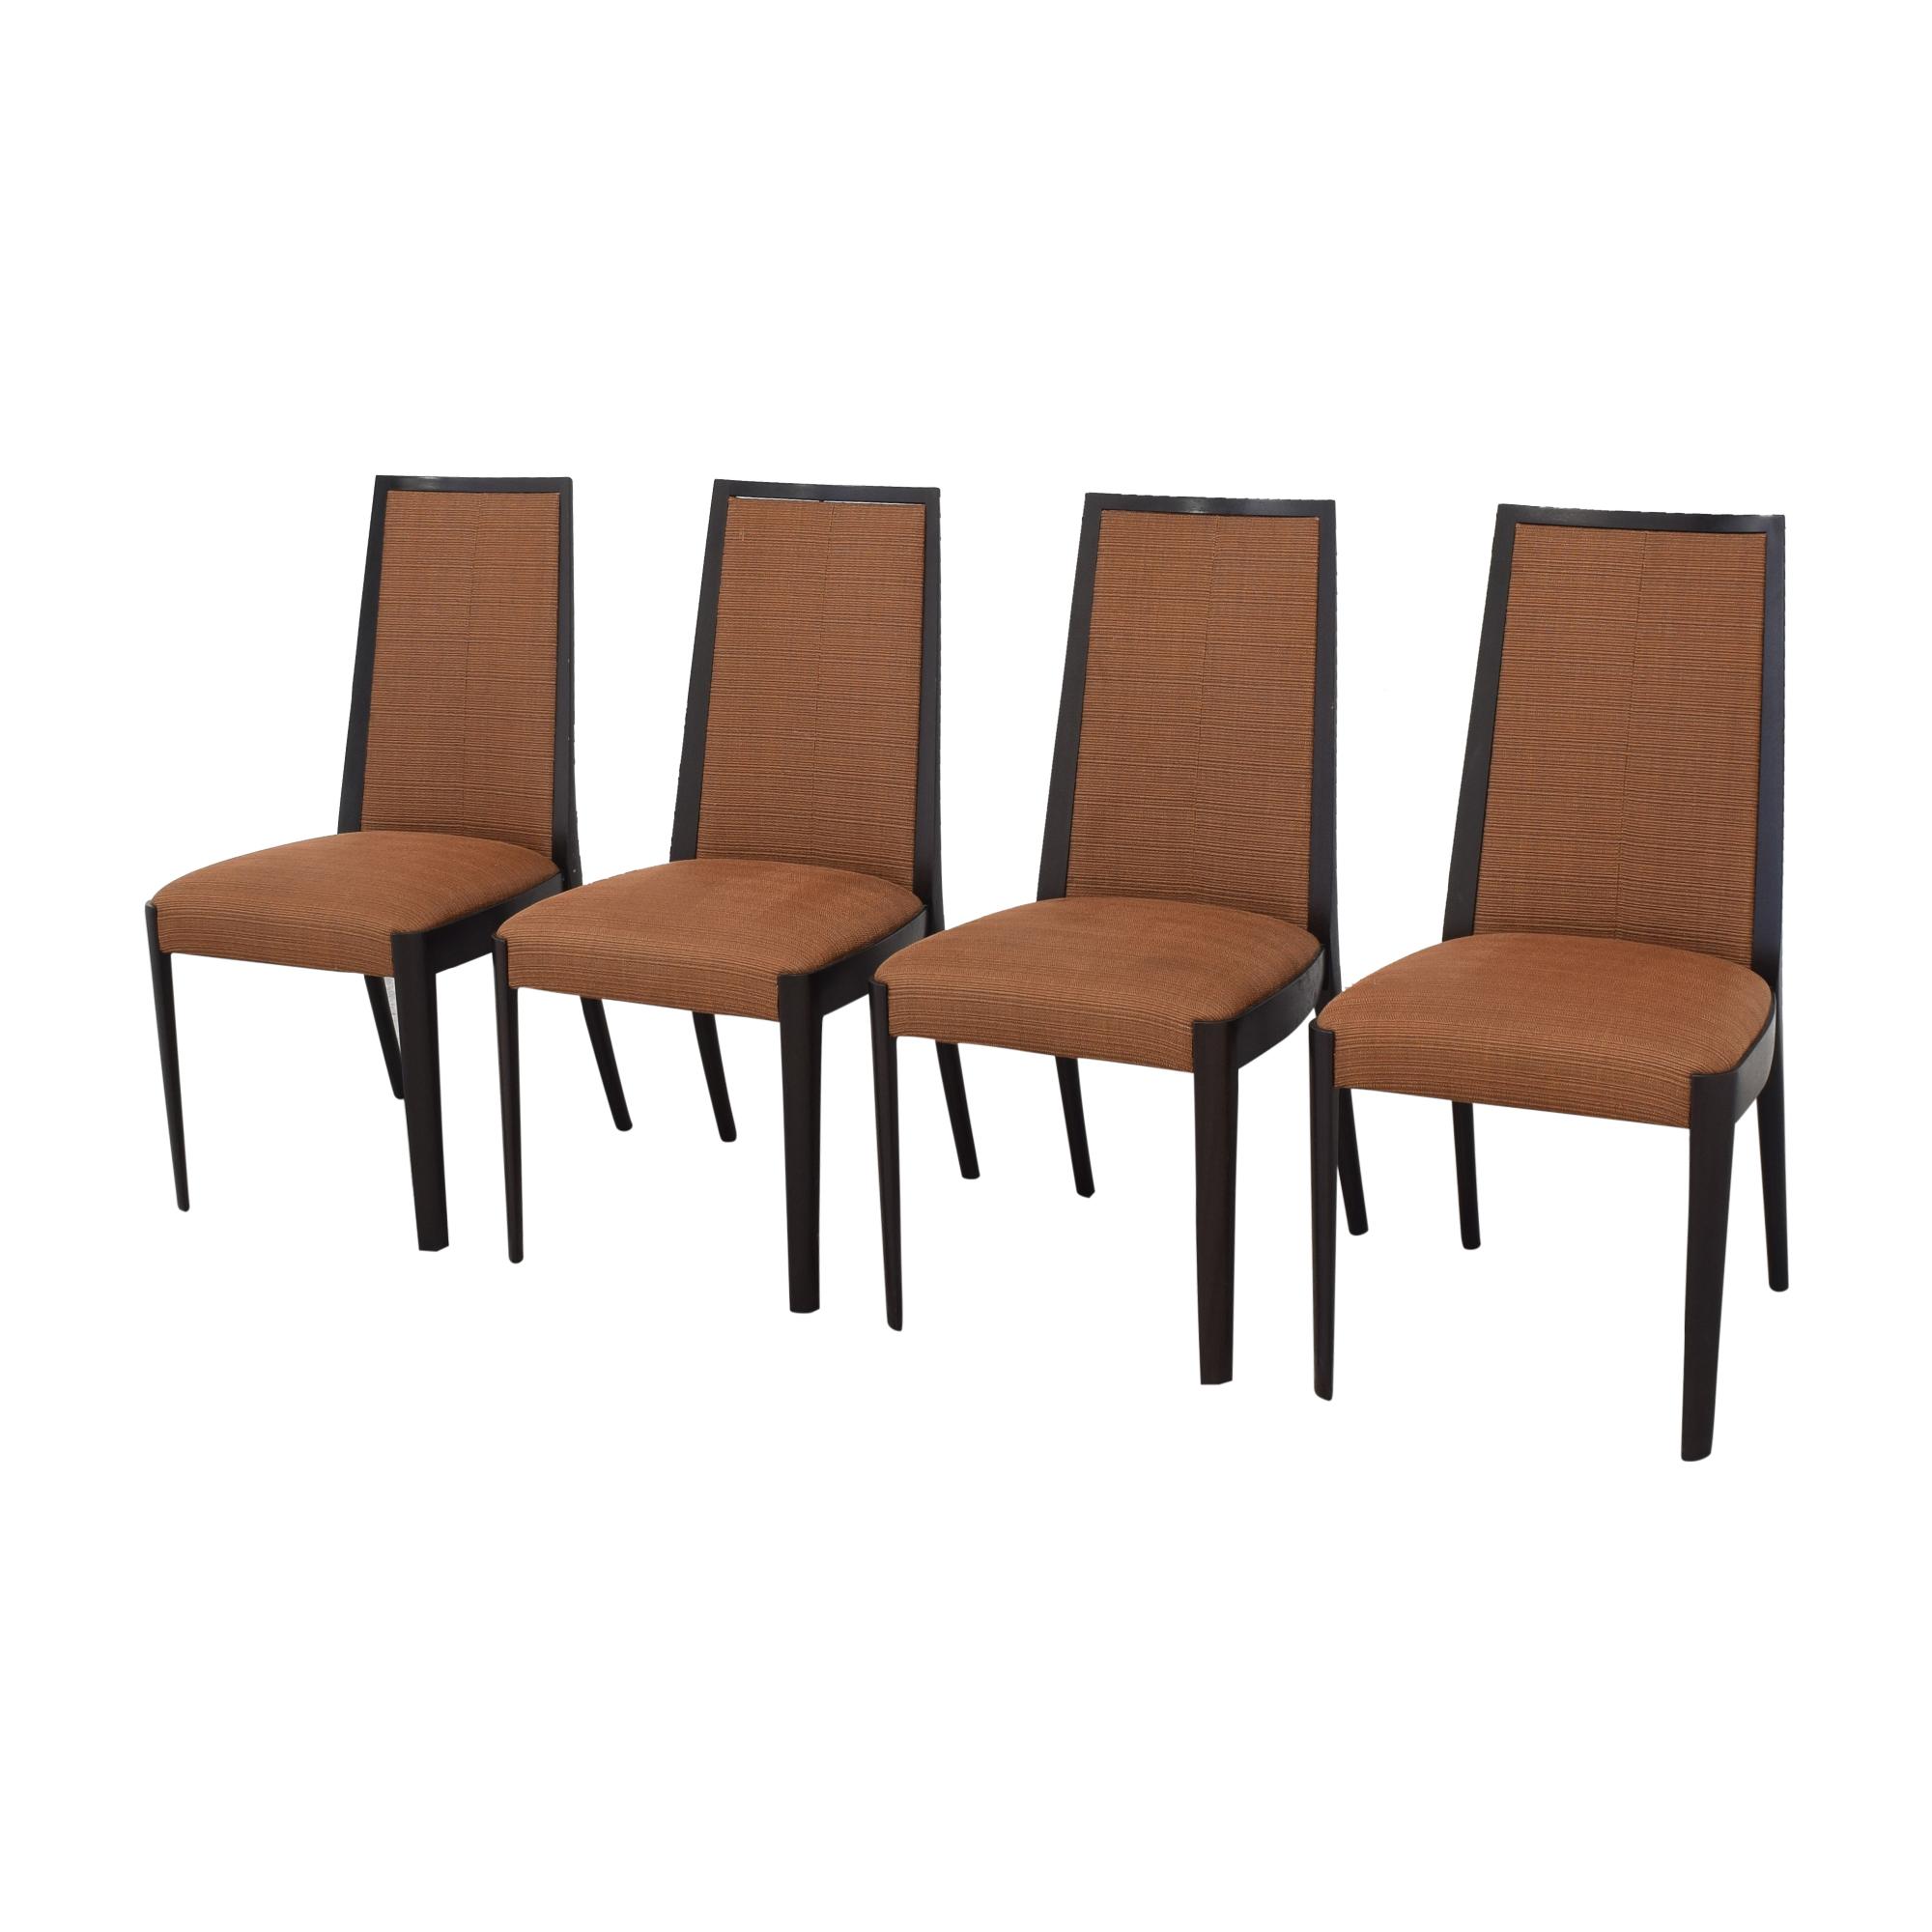 High Back Dining Chairs orange & dark brown